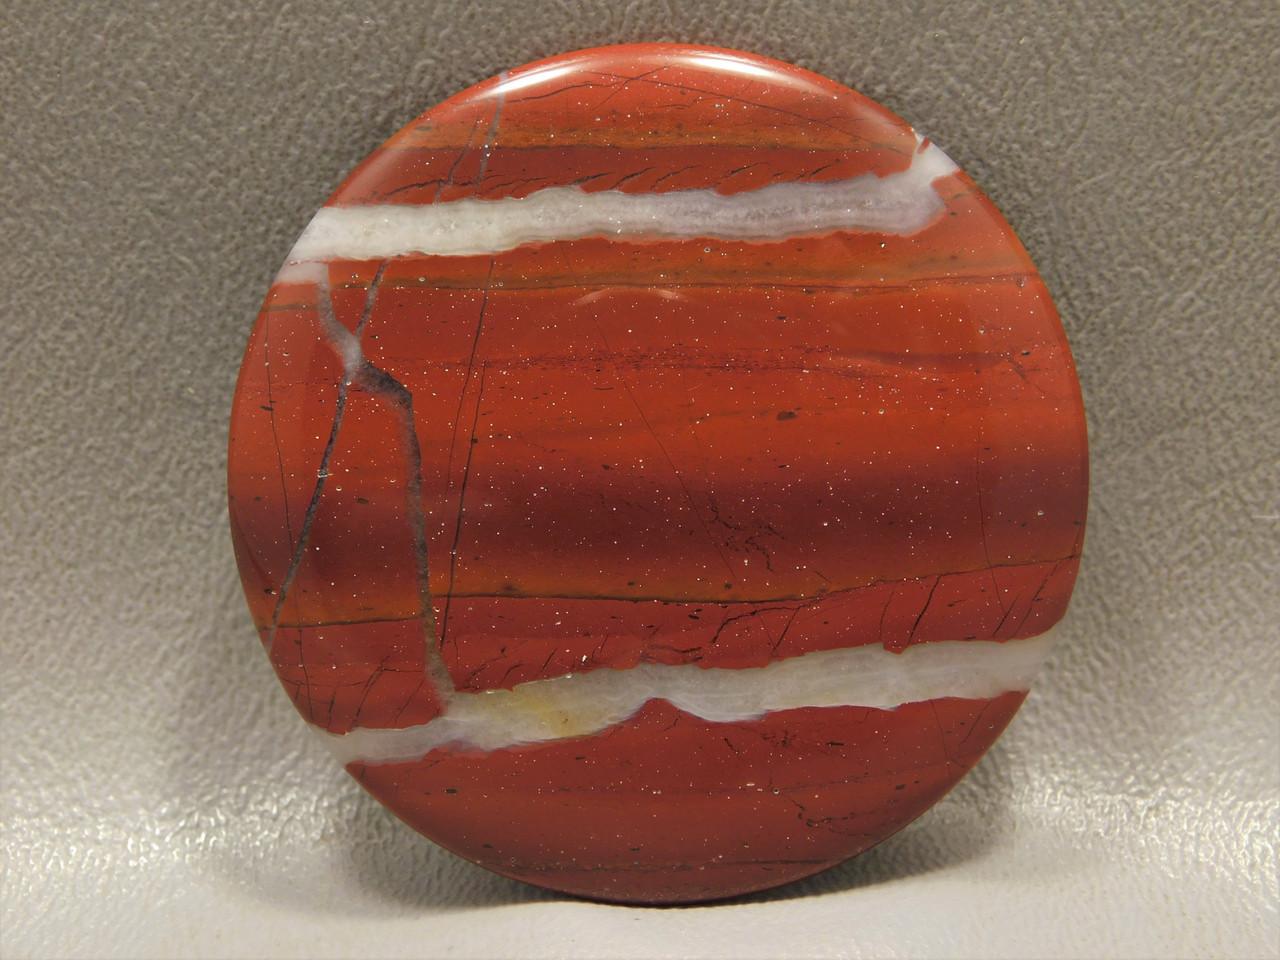 Red White Striped Jasper Cabochon Semi Precious Gemstone #11